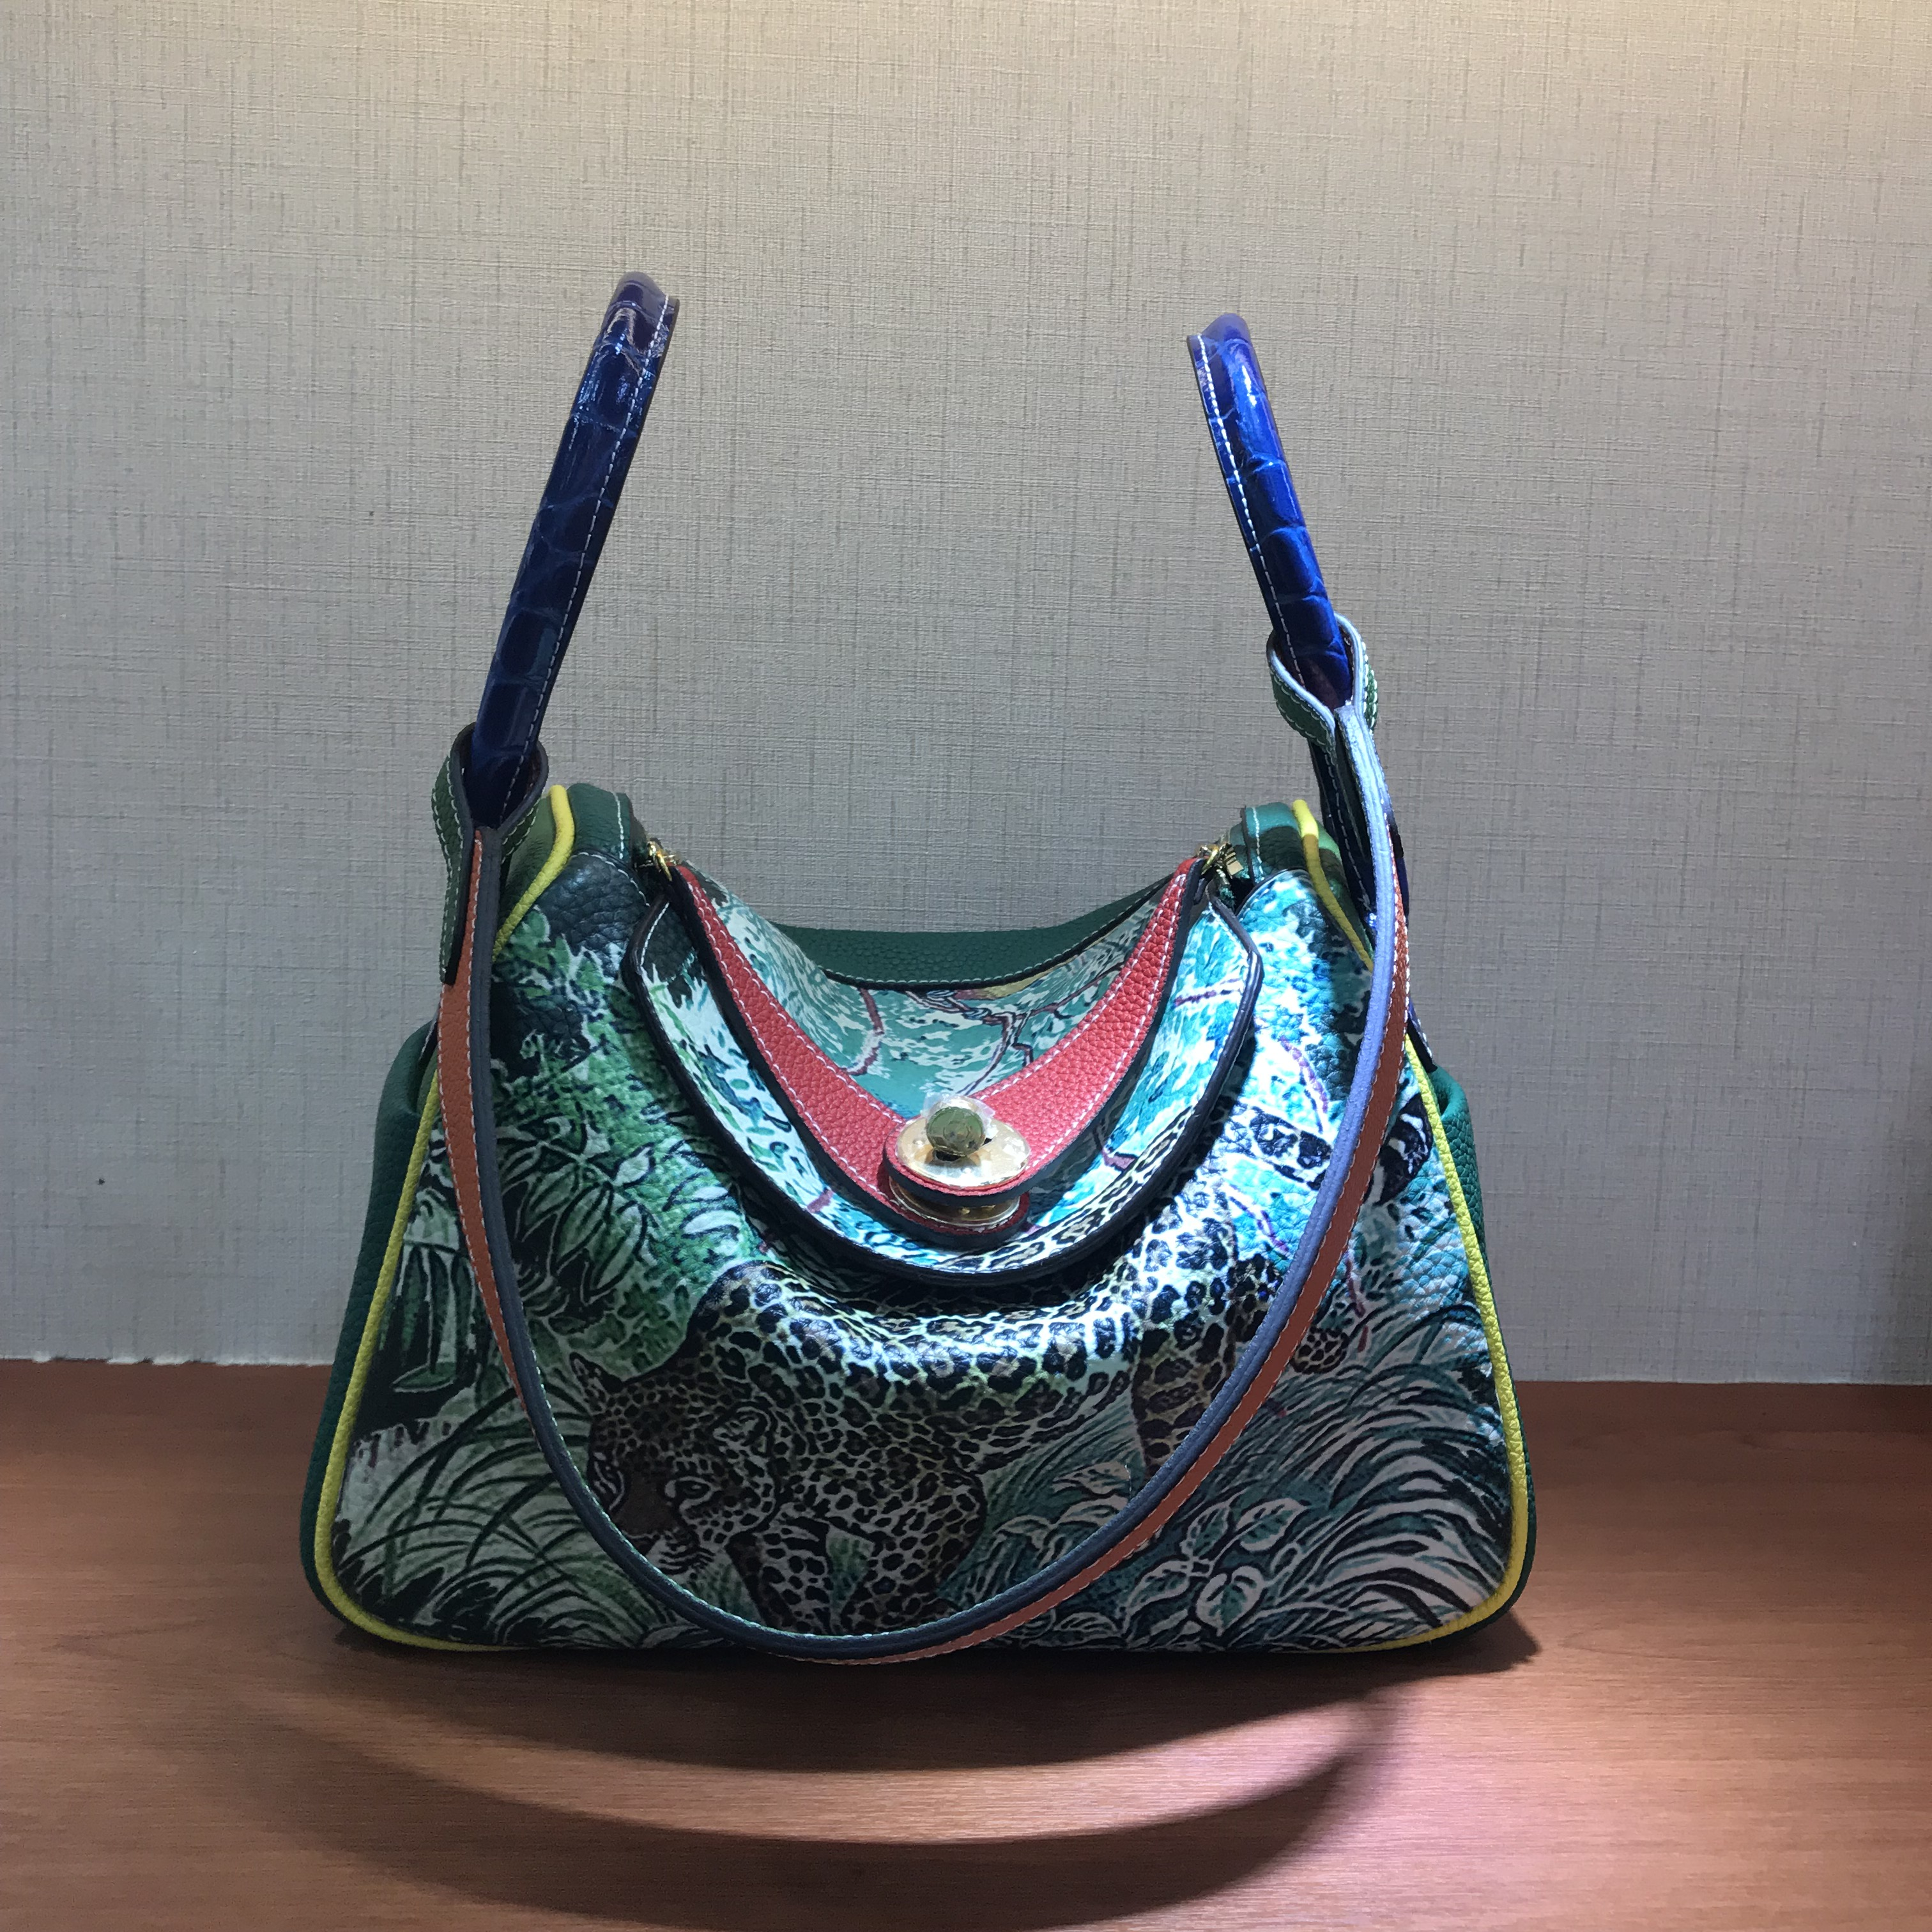 Kafunila genuine cow leather bags for women 2019 luxury handbags women bags designer famous brand crossbody bag bolsa feminina in Top Handle Bags from Luggage Bags